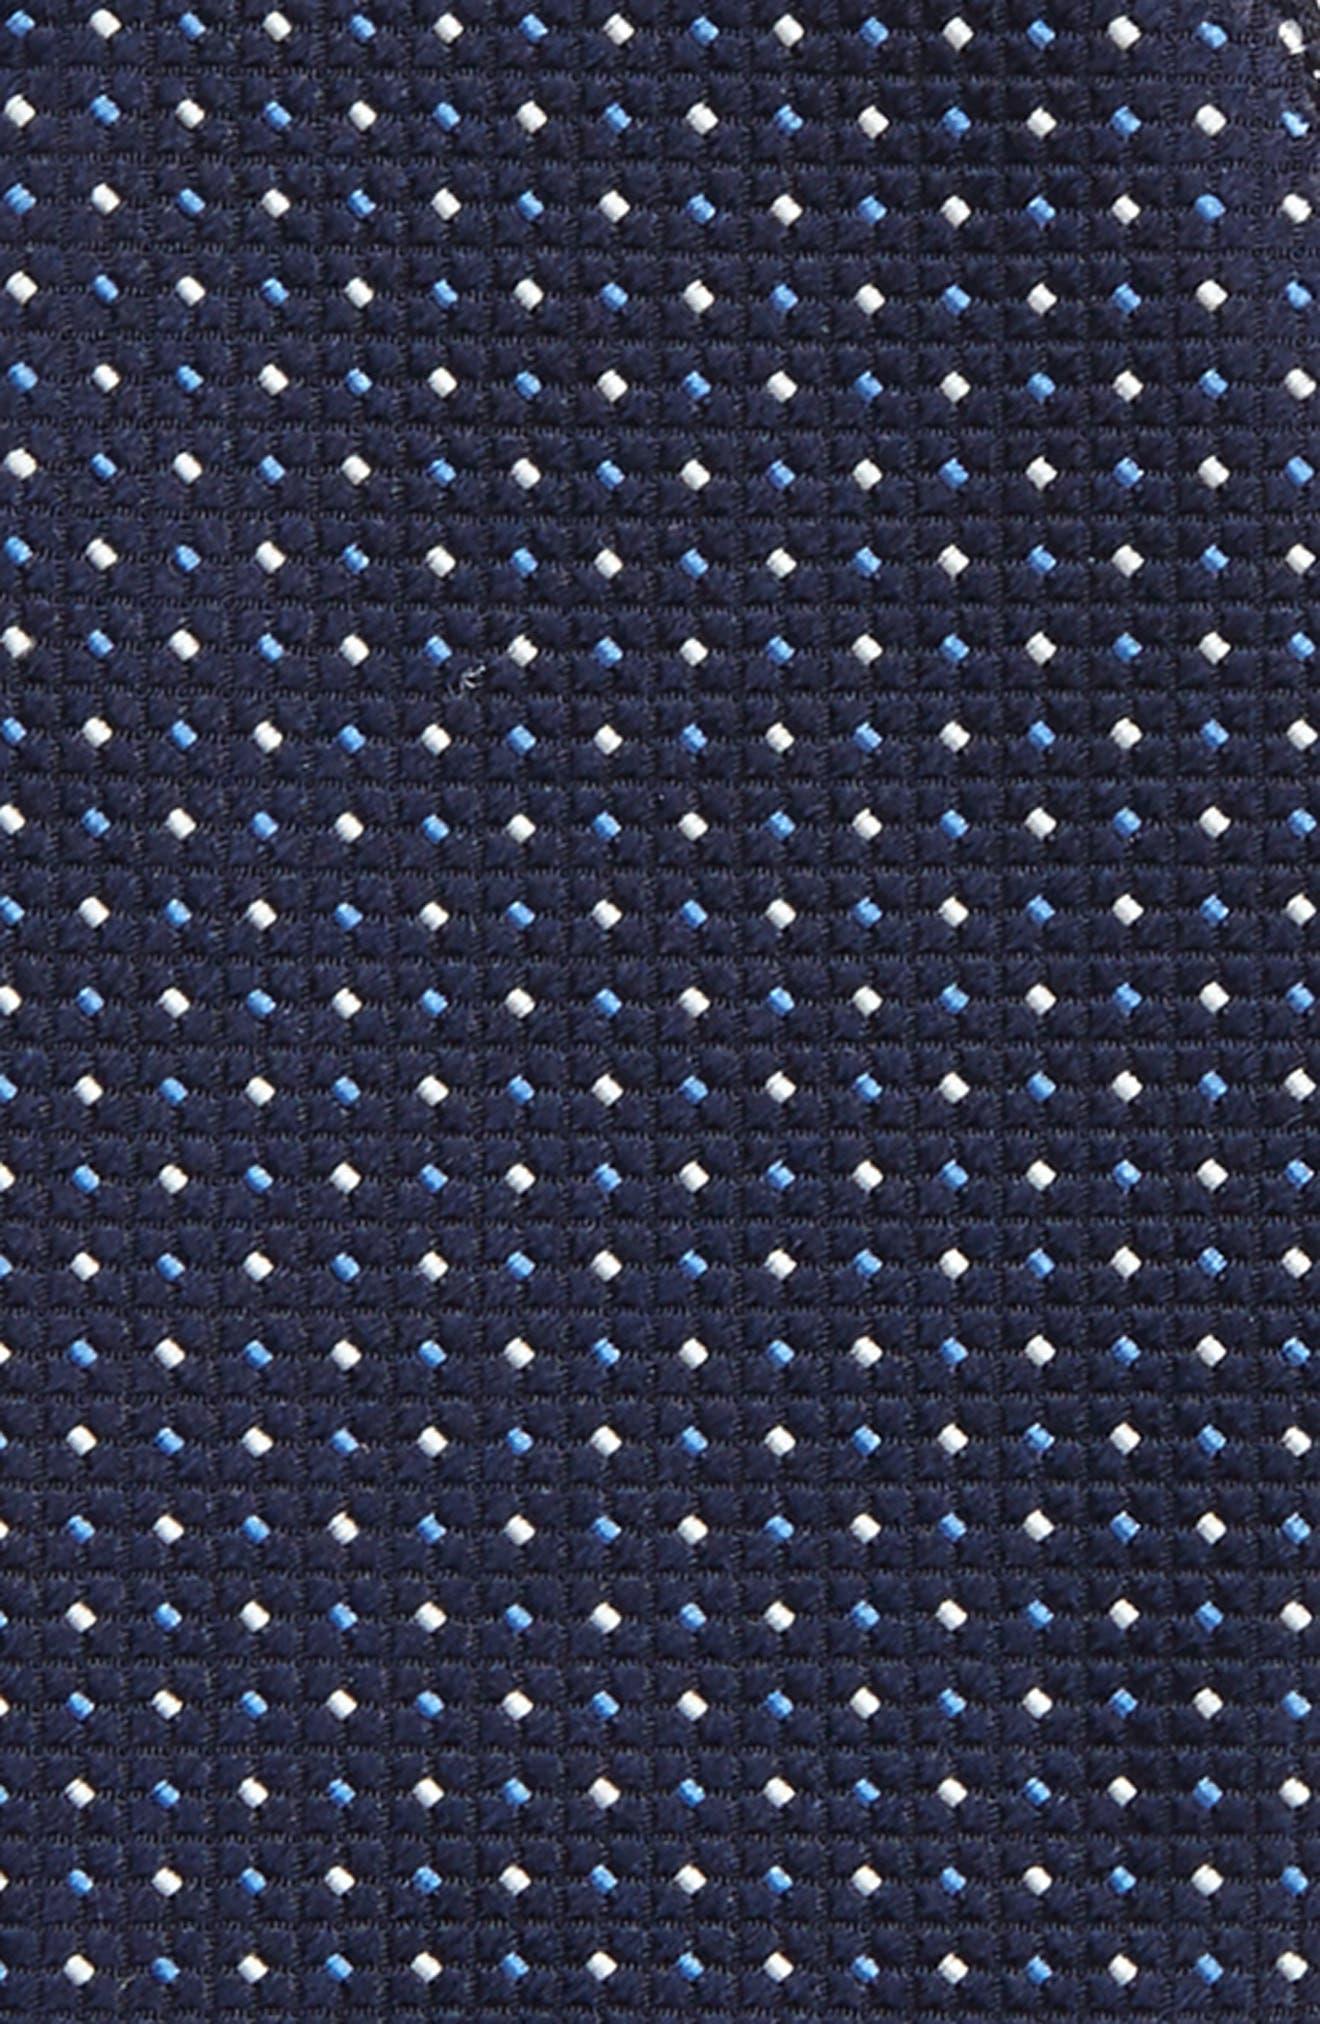 Dot Silk Bow Tie,                             Alternate thumbnail 3, color,                             410